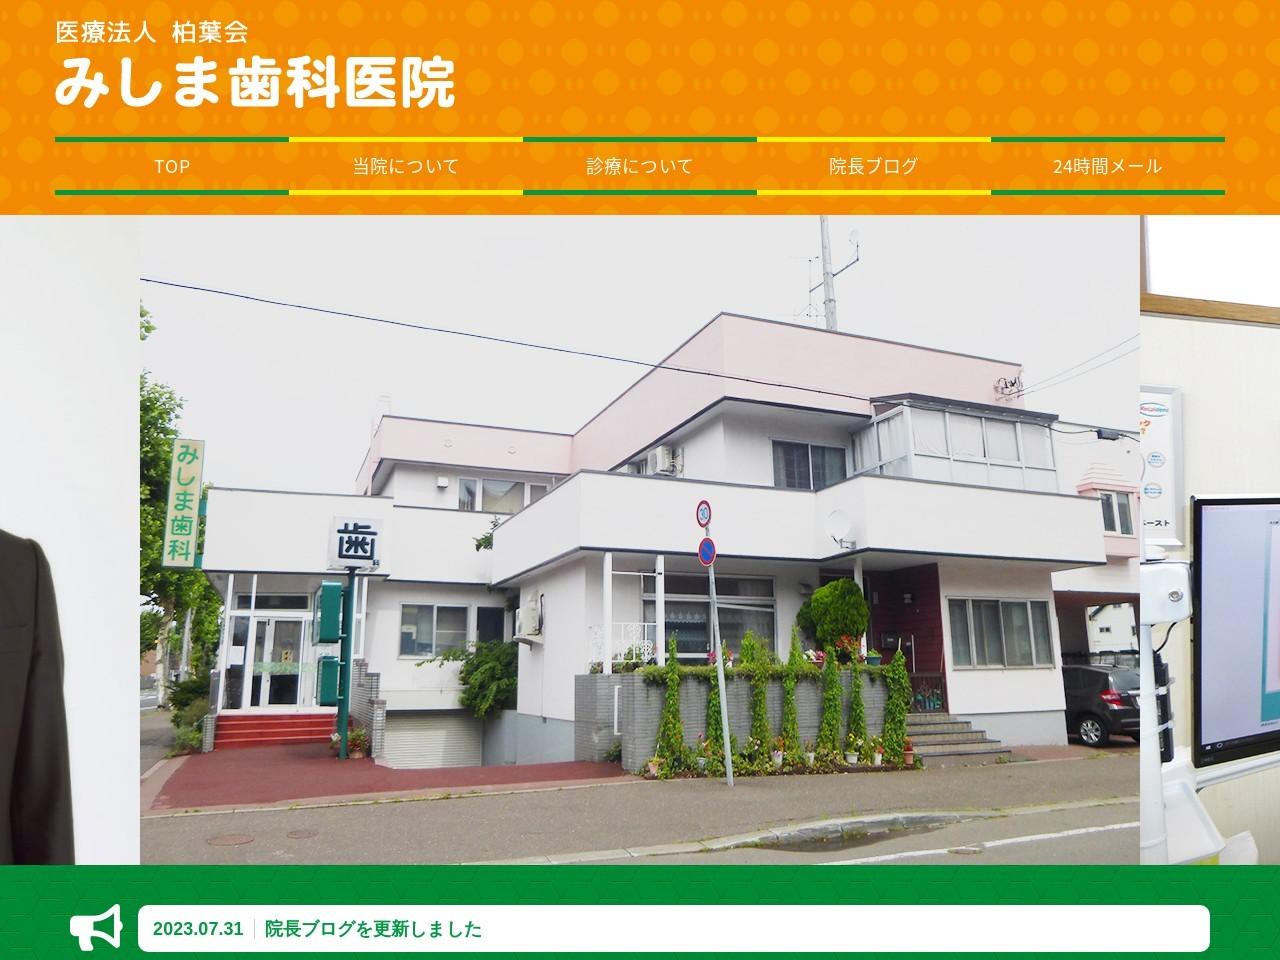 医療法人柏葉会  みしま歯科医院 7条院 (北海道岩見沢市)